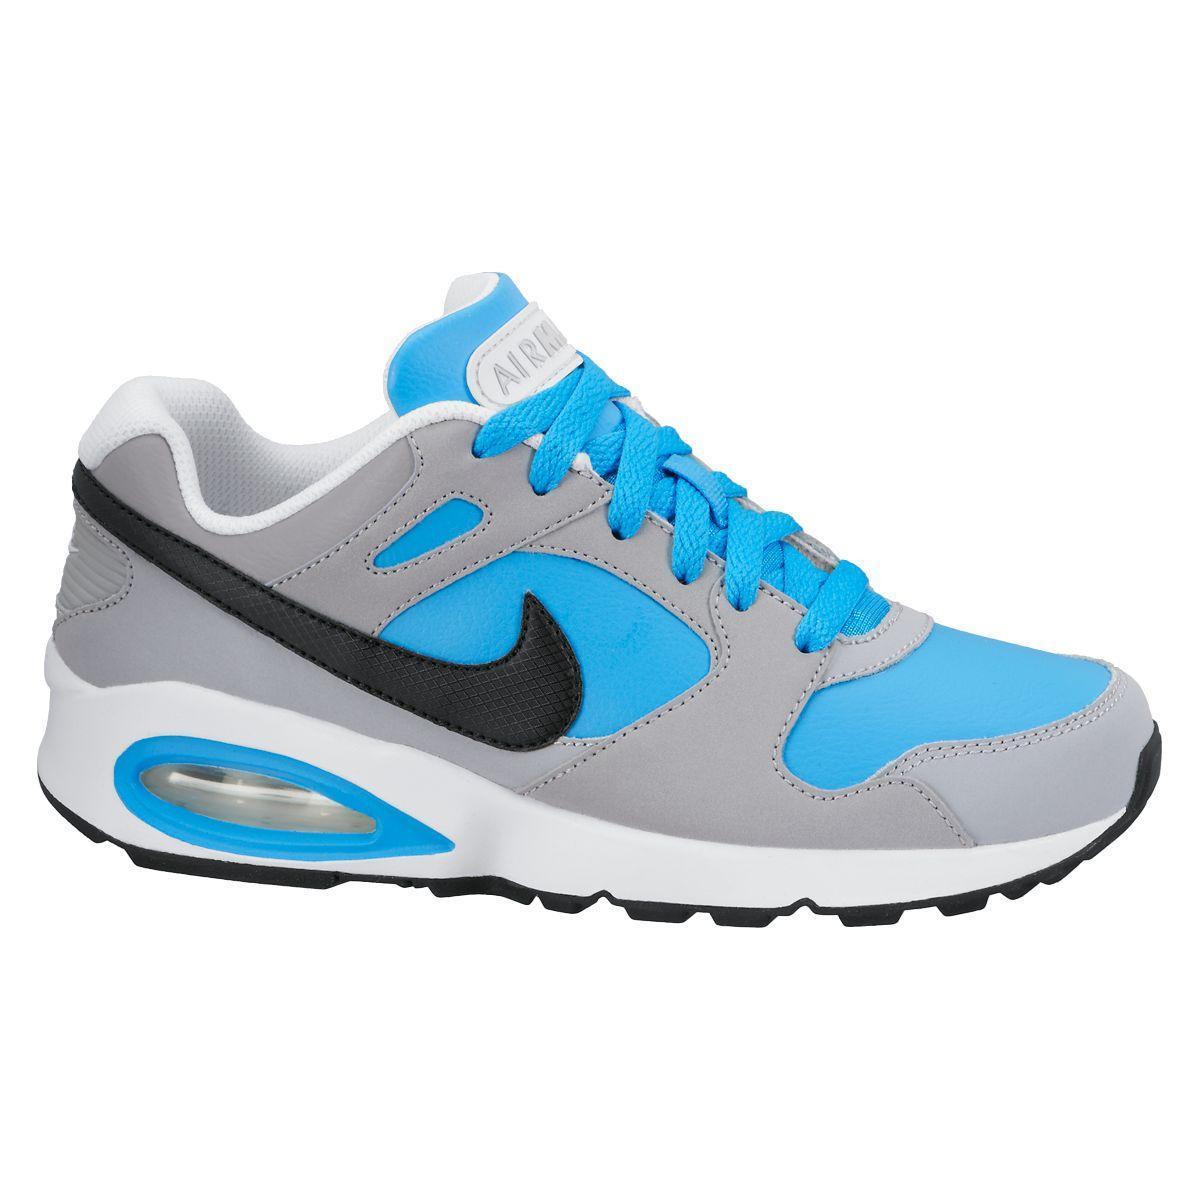 Nike Boys Air Max Coliseam Running Shoes - Blue/Grey (Size ...